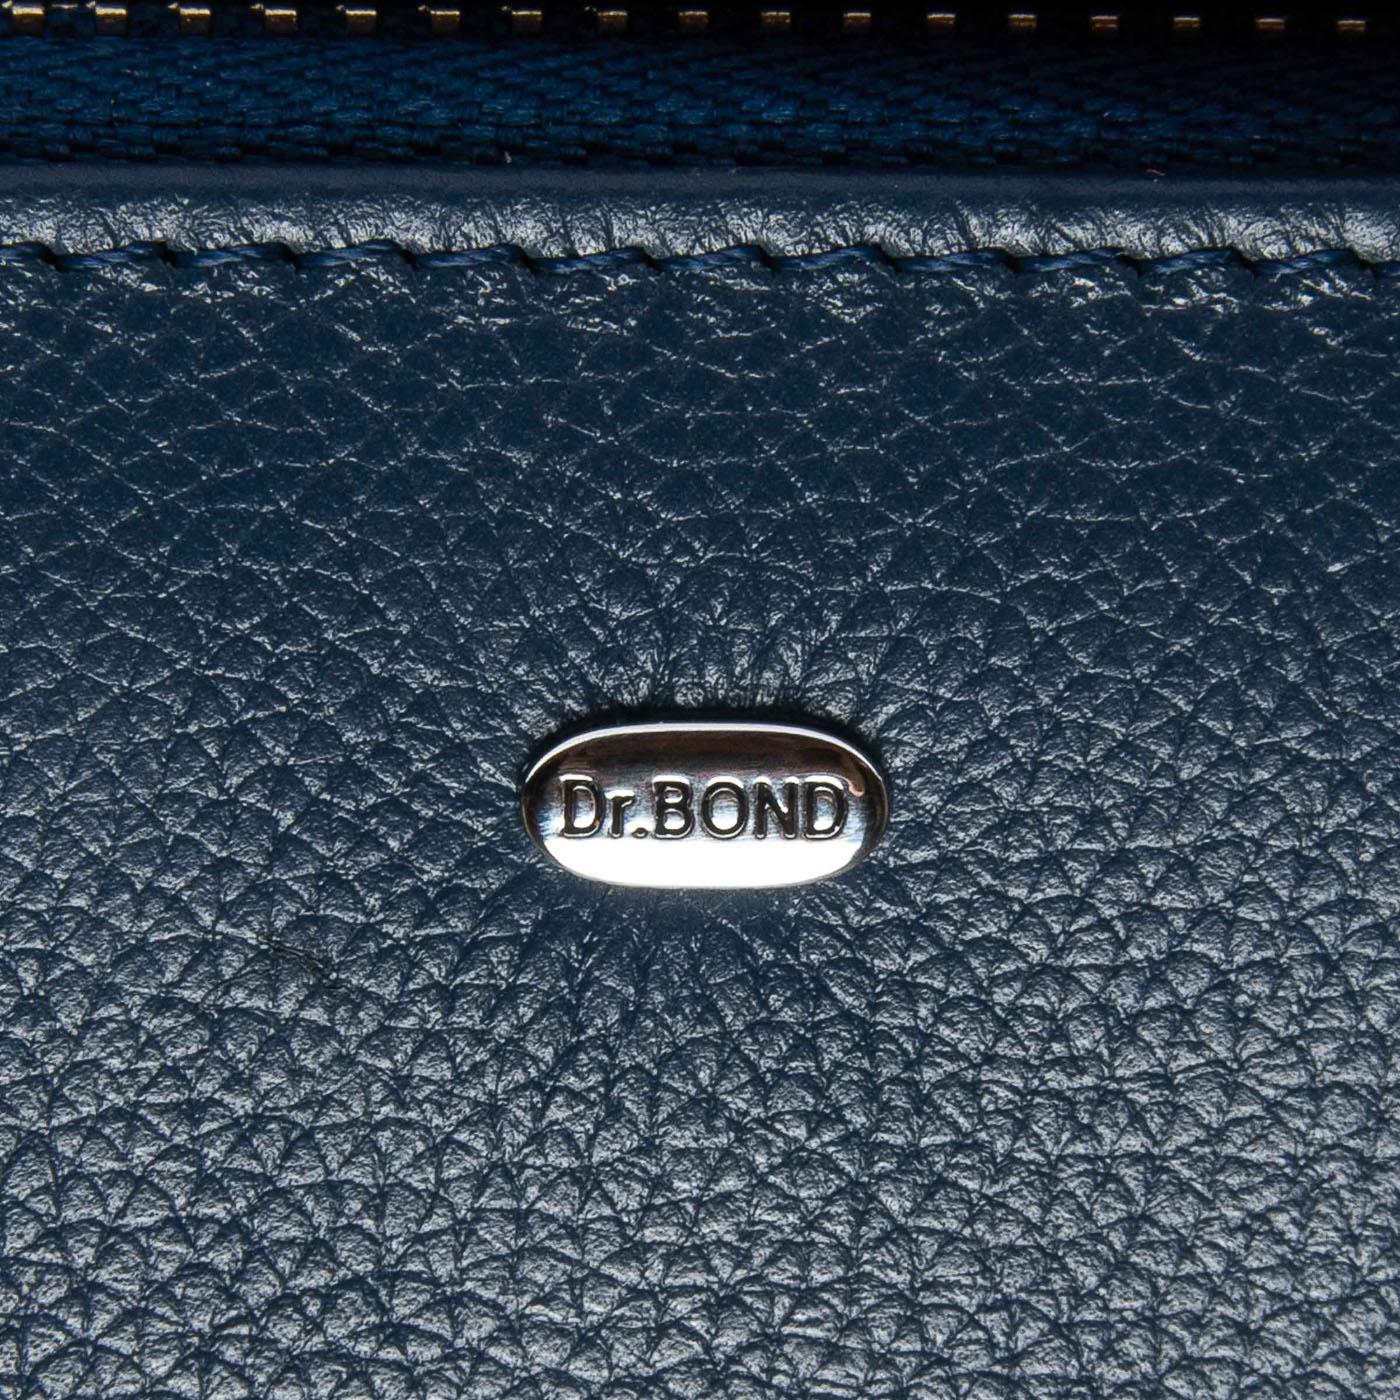 Кошелек Classic кожа DR. BOND WS-8 blue